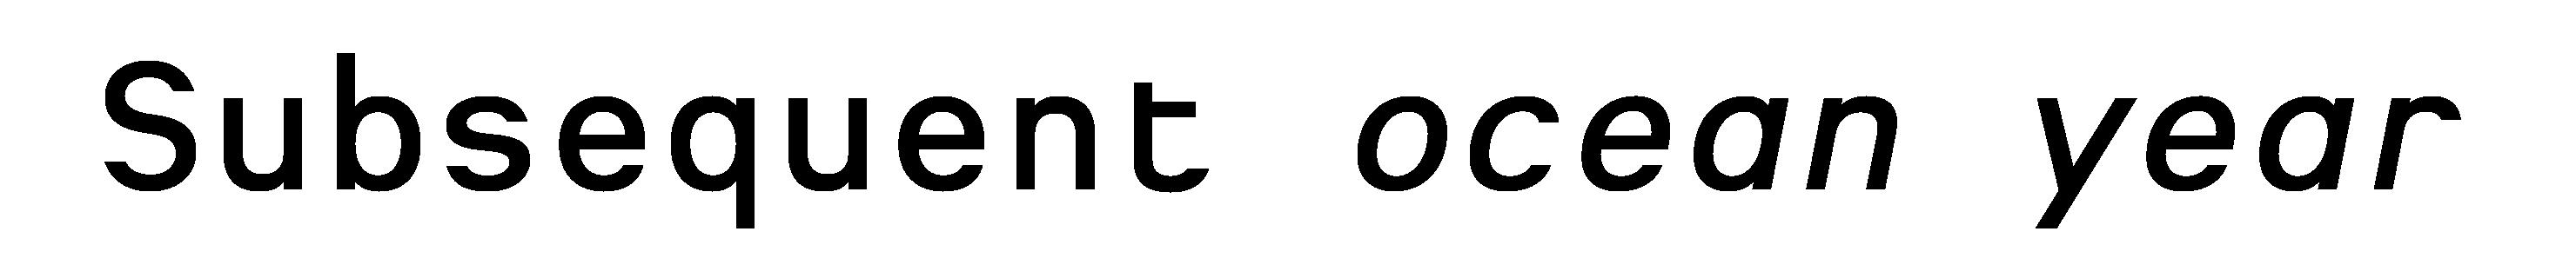 Typeface Heimat Mono D010 Atlas Font Foundry